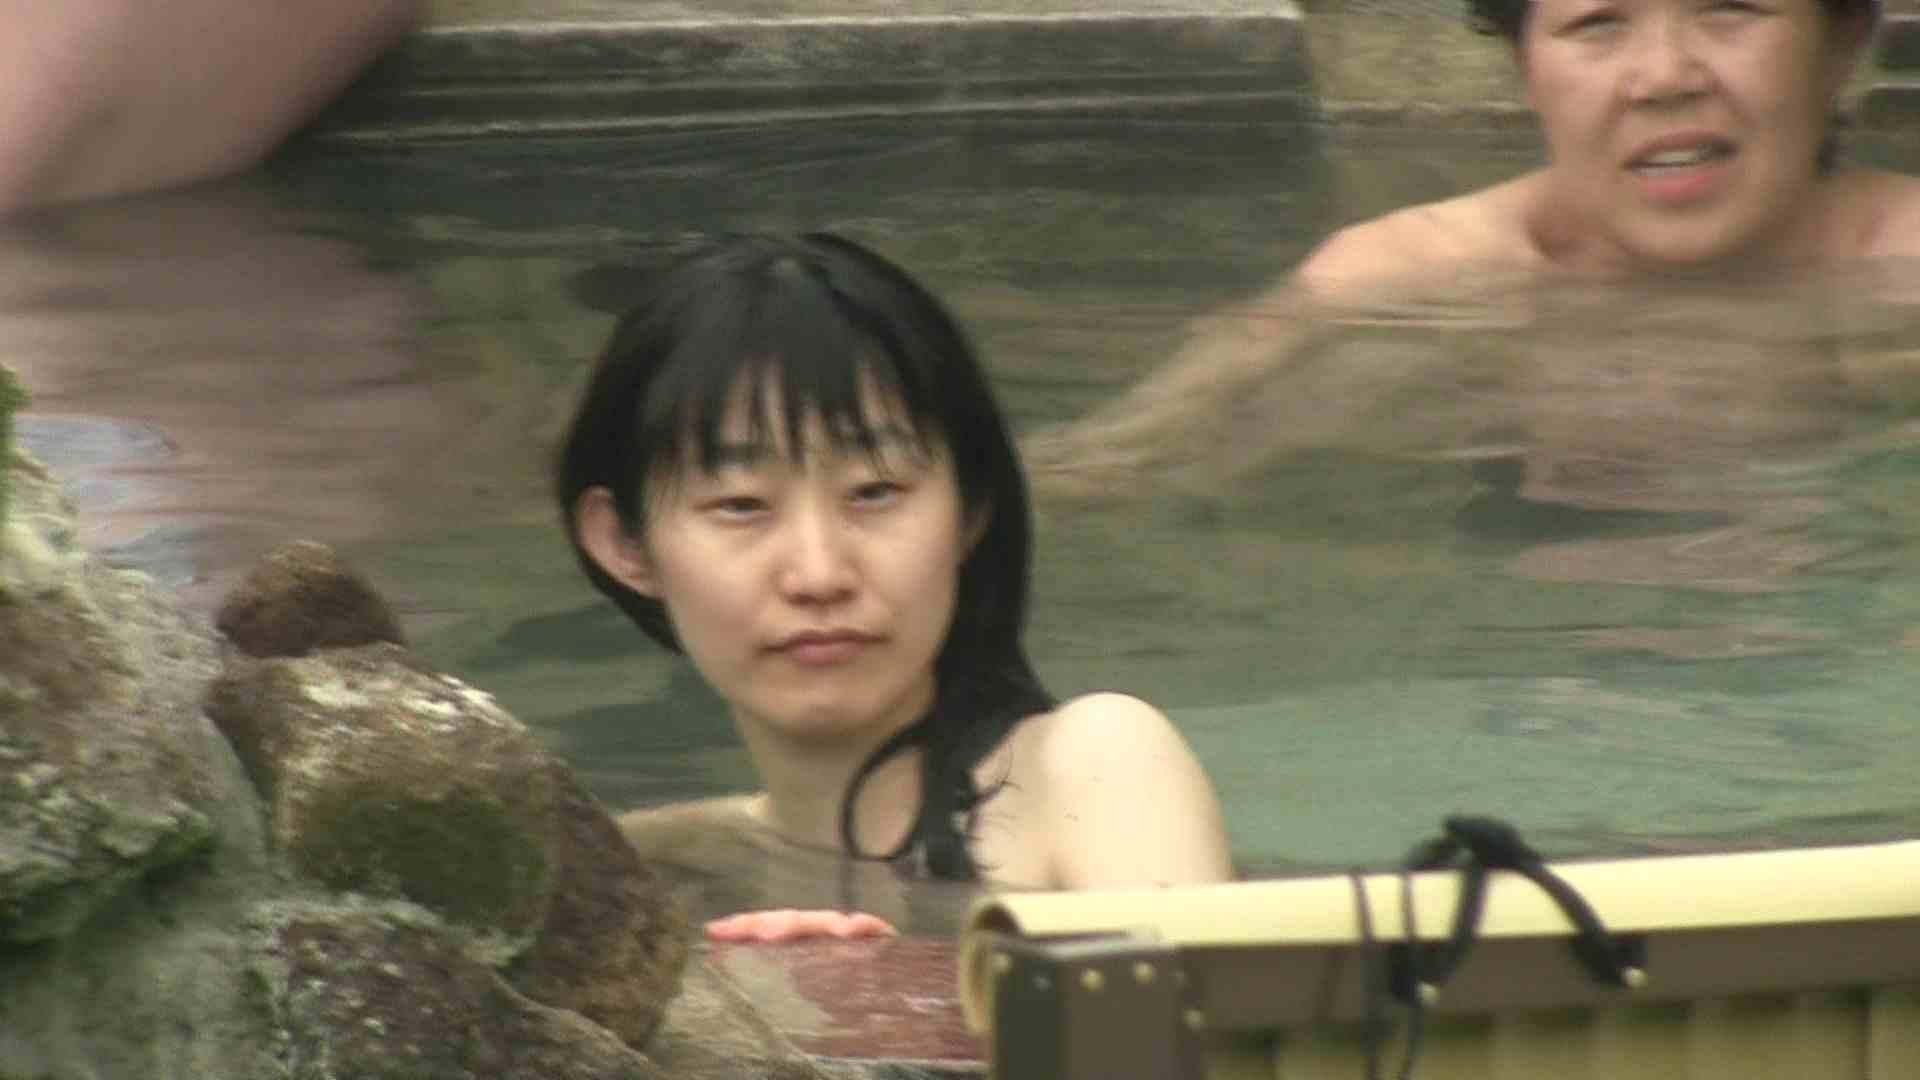 Aquaな露天風呂Vol.14【VIP】 盗撮シリーズ   露天風呂編  94PIX 39